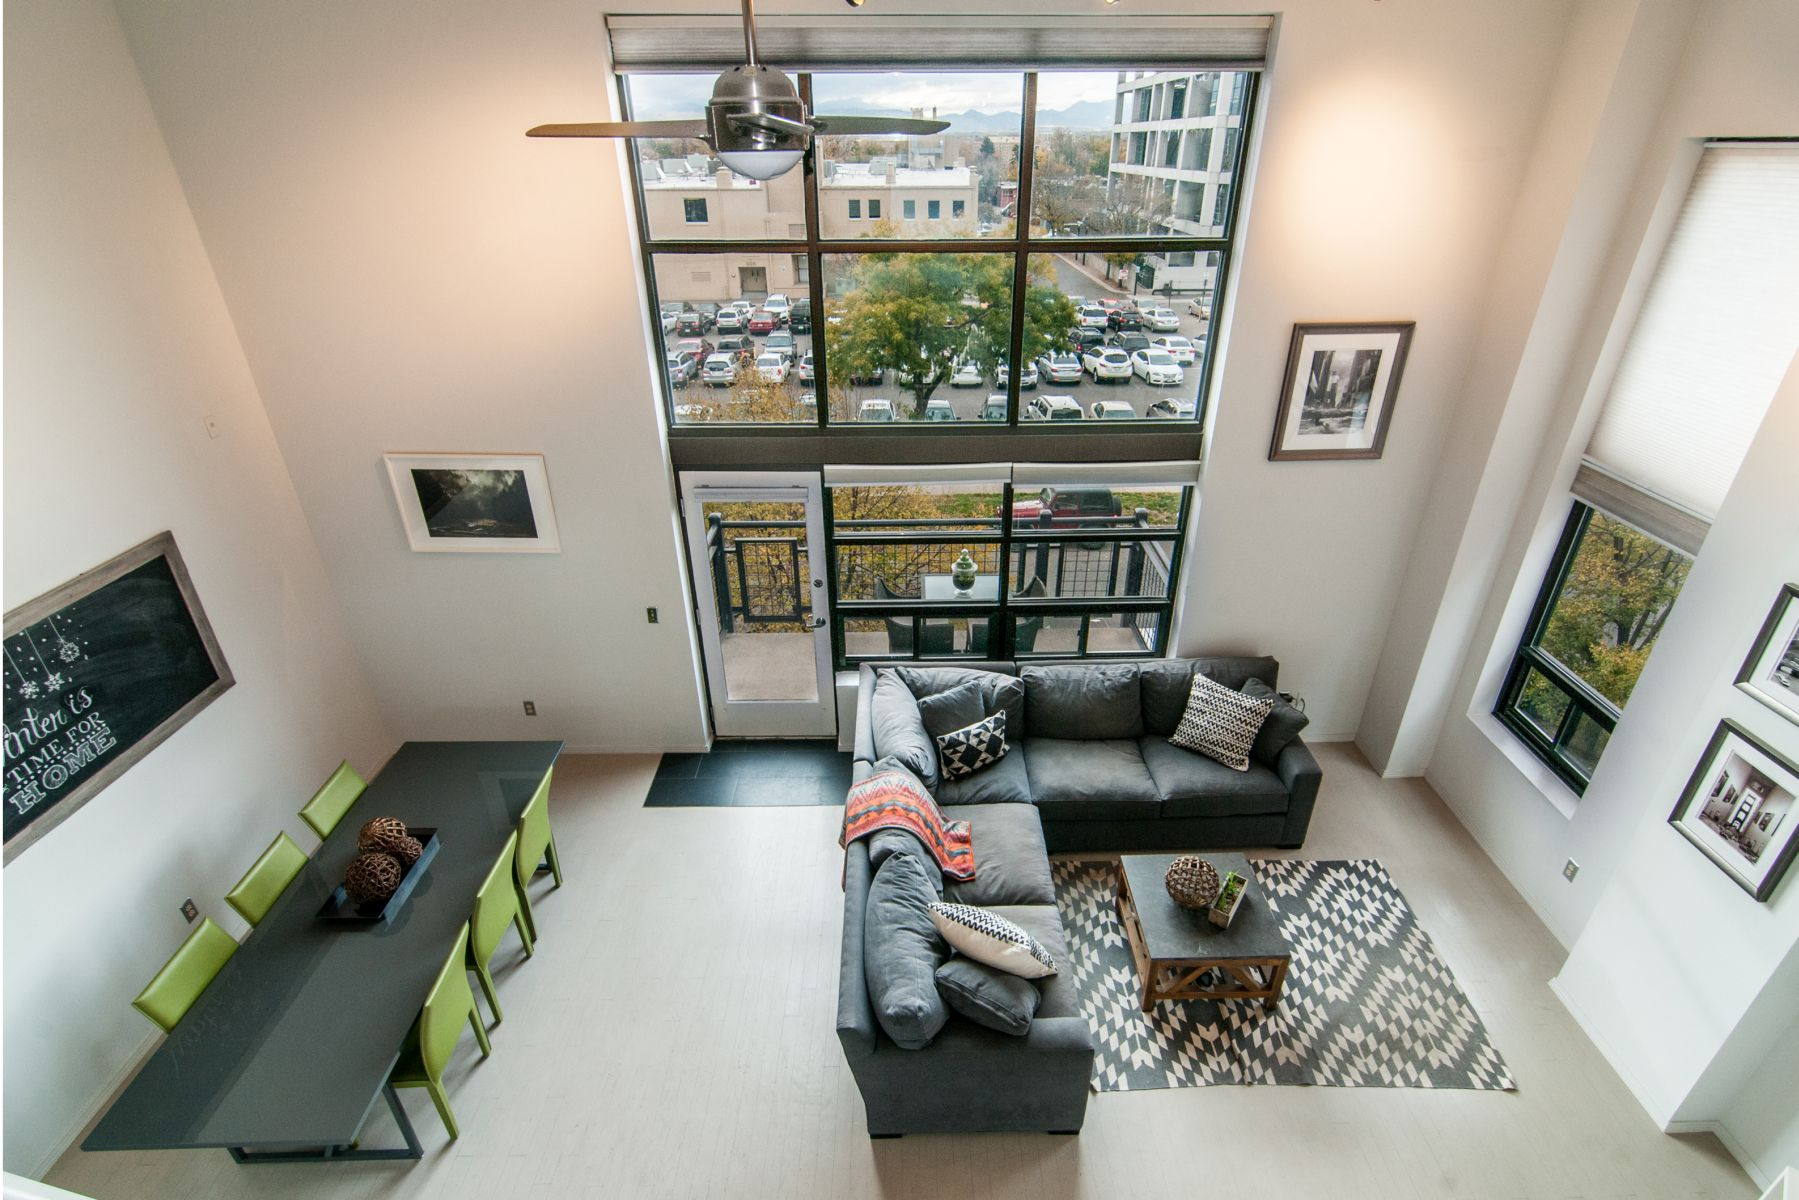 Condominium for Sale at Sleek, Chic and Unique 930 Acoma Street #205 Denver, Colorado 80204 United States